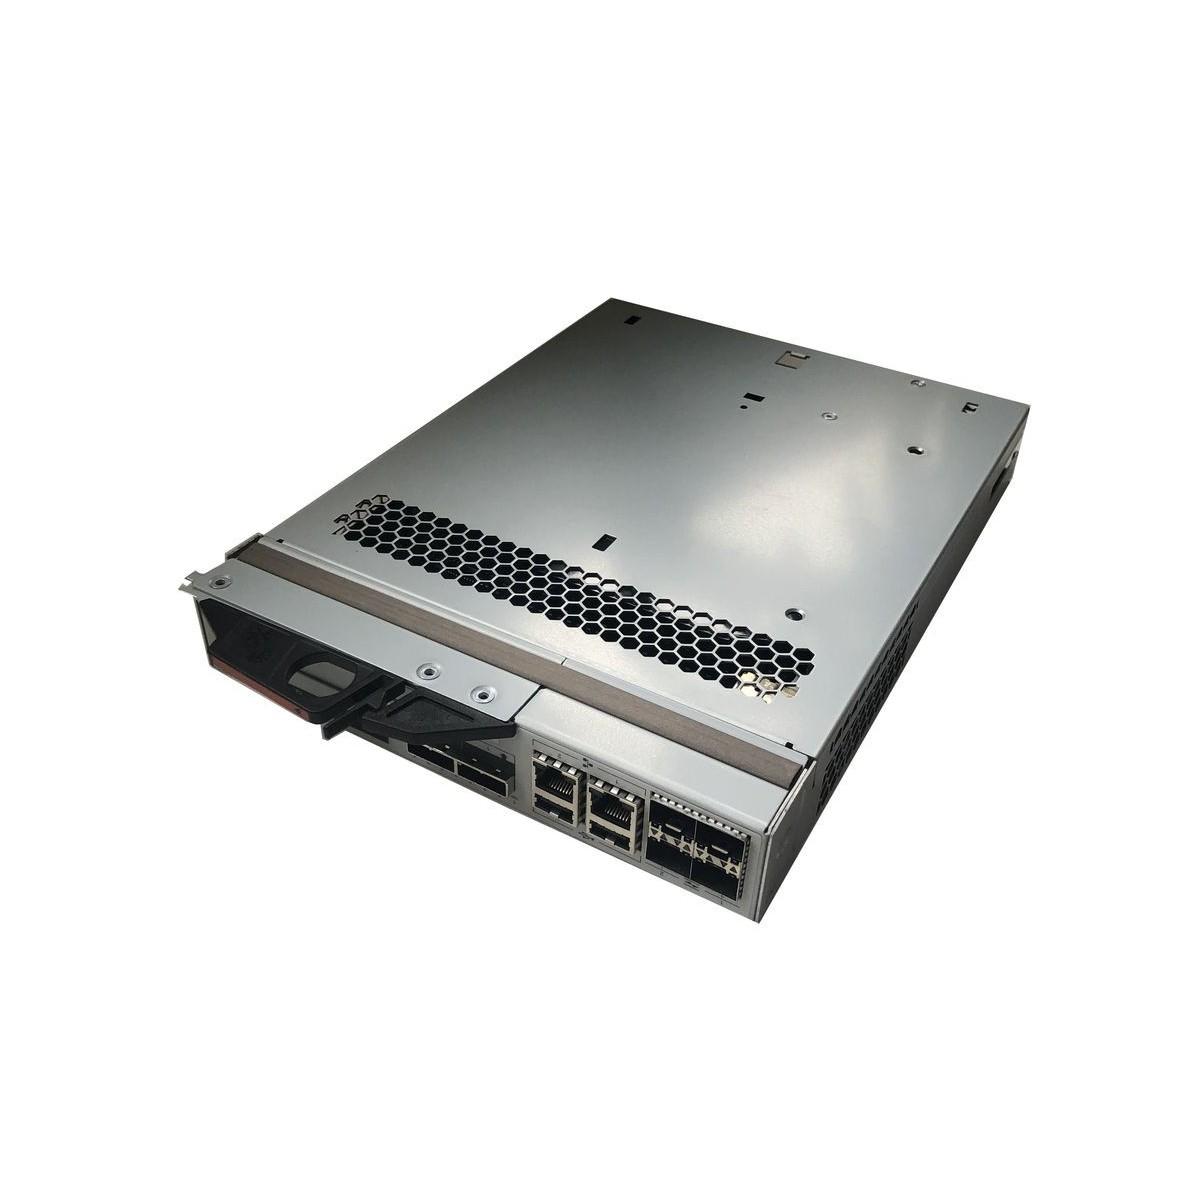 STORAGE CONTROLLER IBM STORWIZE V7000 00L4645